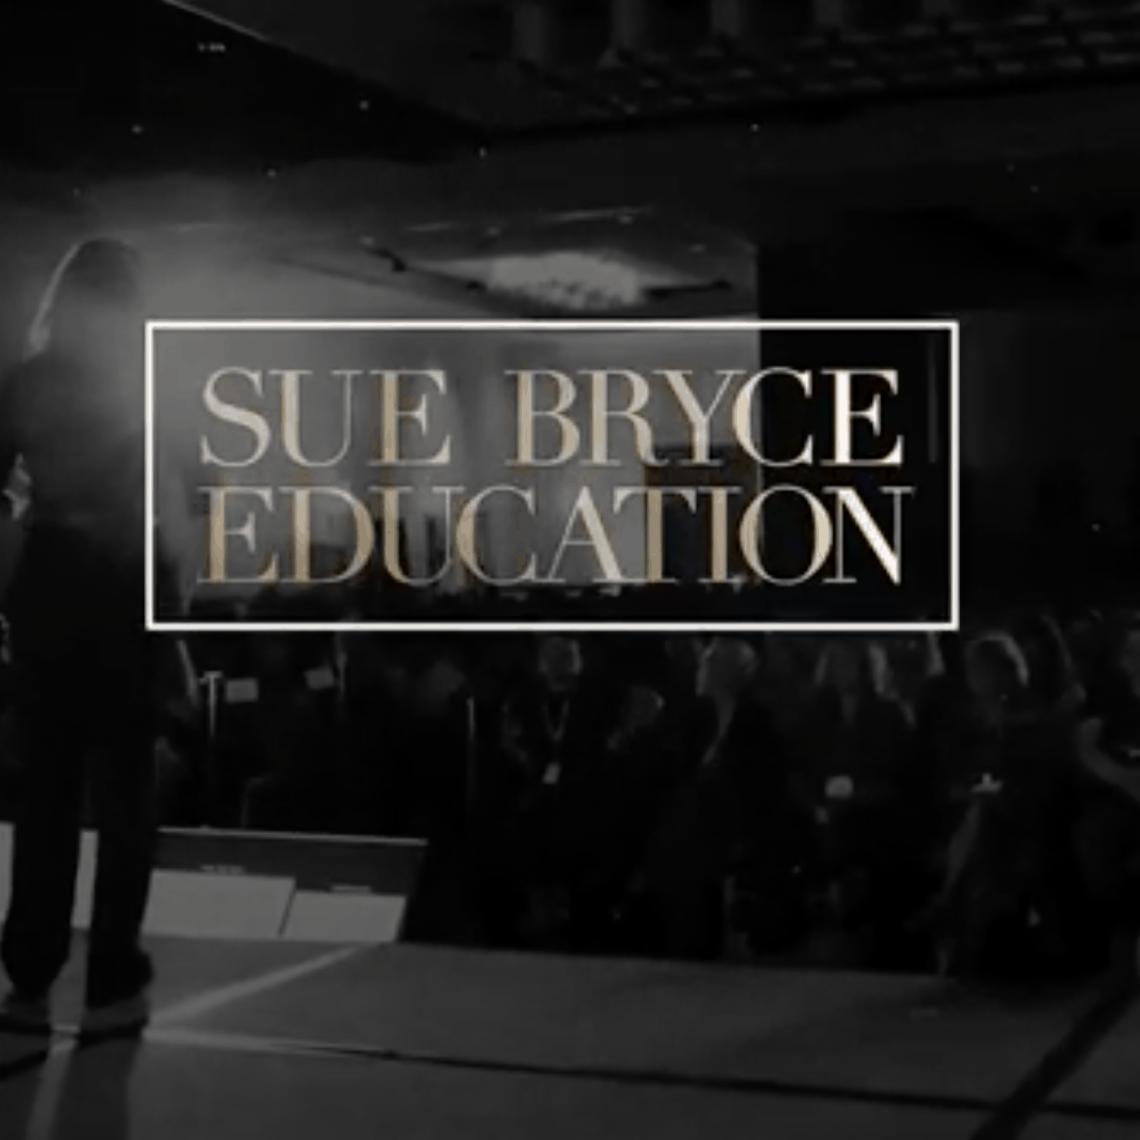 sue bryce education acquisition